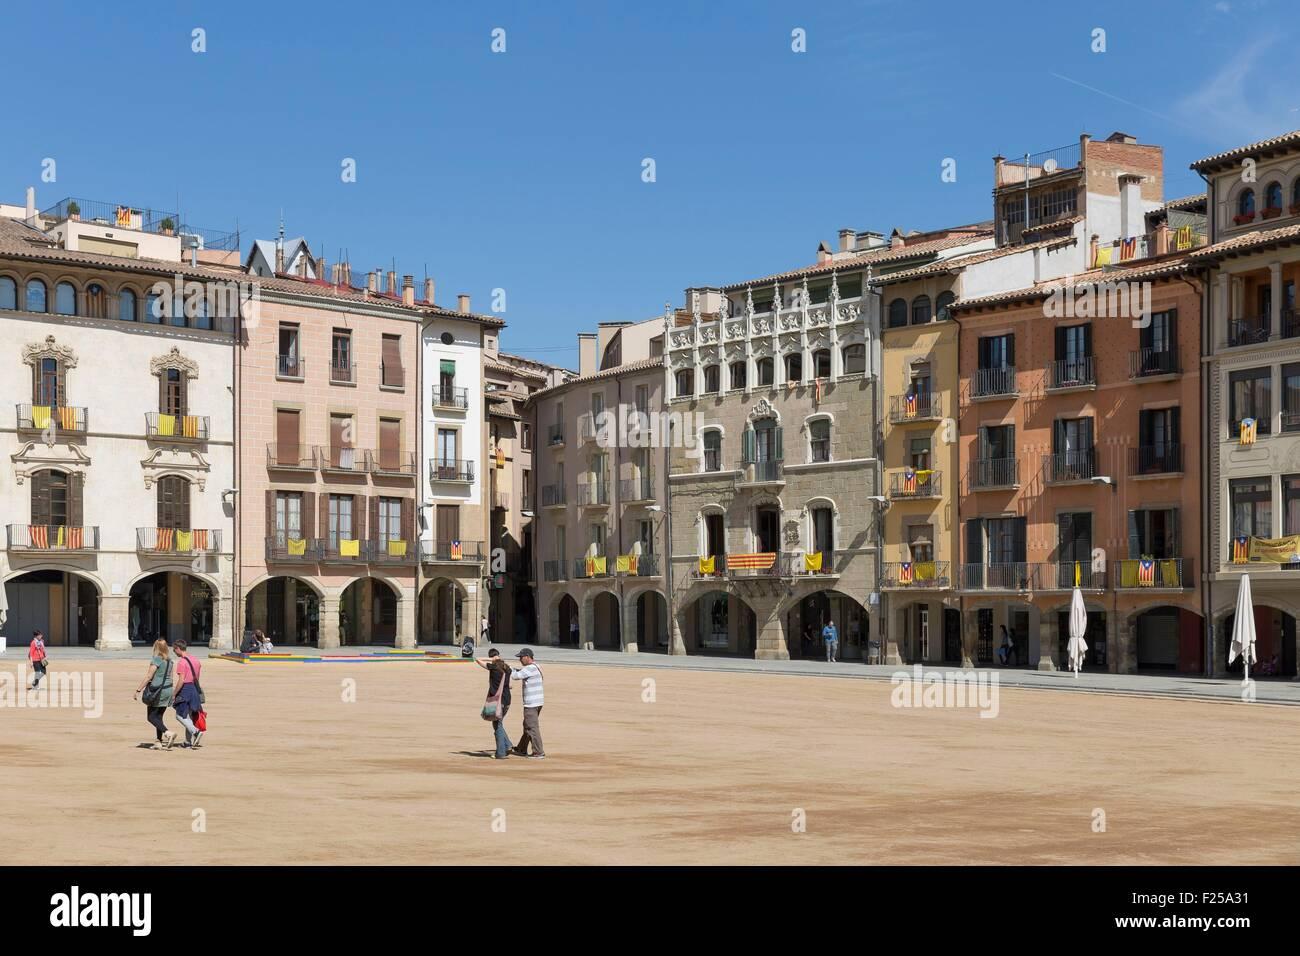 Spain, Catalonia, Vic, Plaτa Major - Stock Image